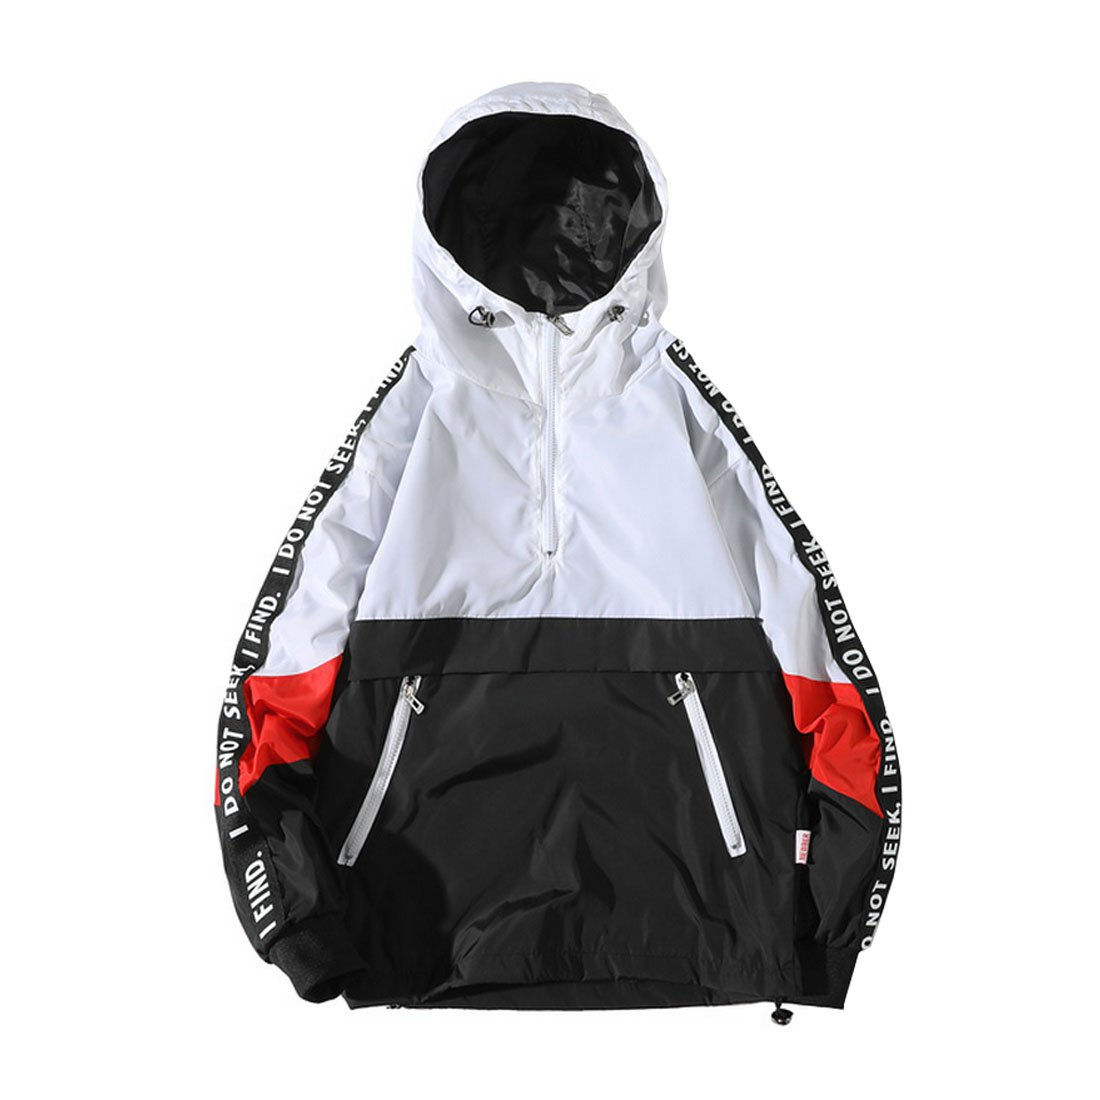 Hzcx Fashion Mens Pullover Hooded Waterproof Lightweight Windbreaker Jackets SJXZ709-JK06-60-W-US M TAG L